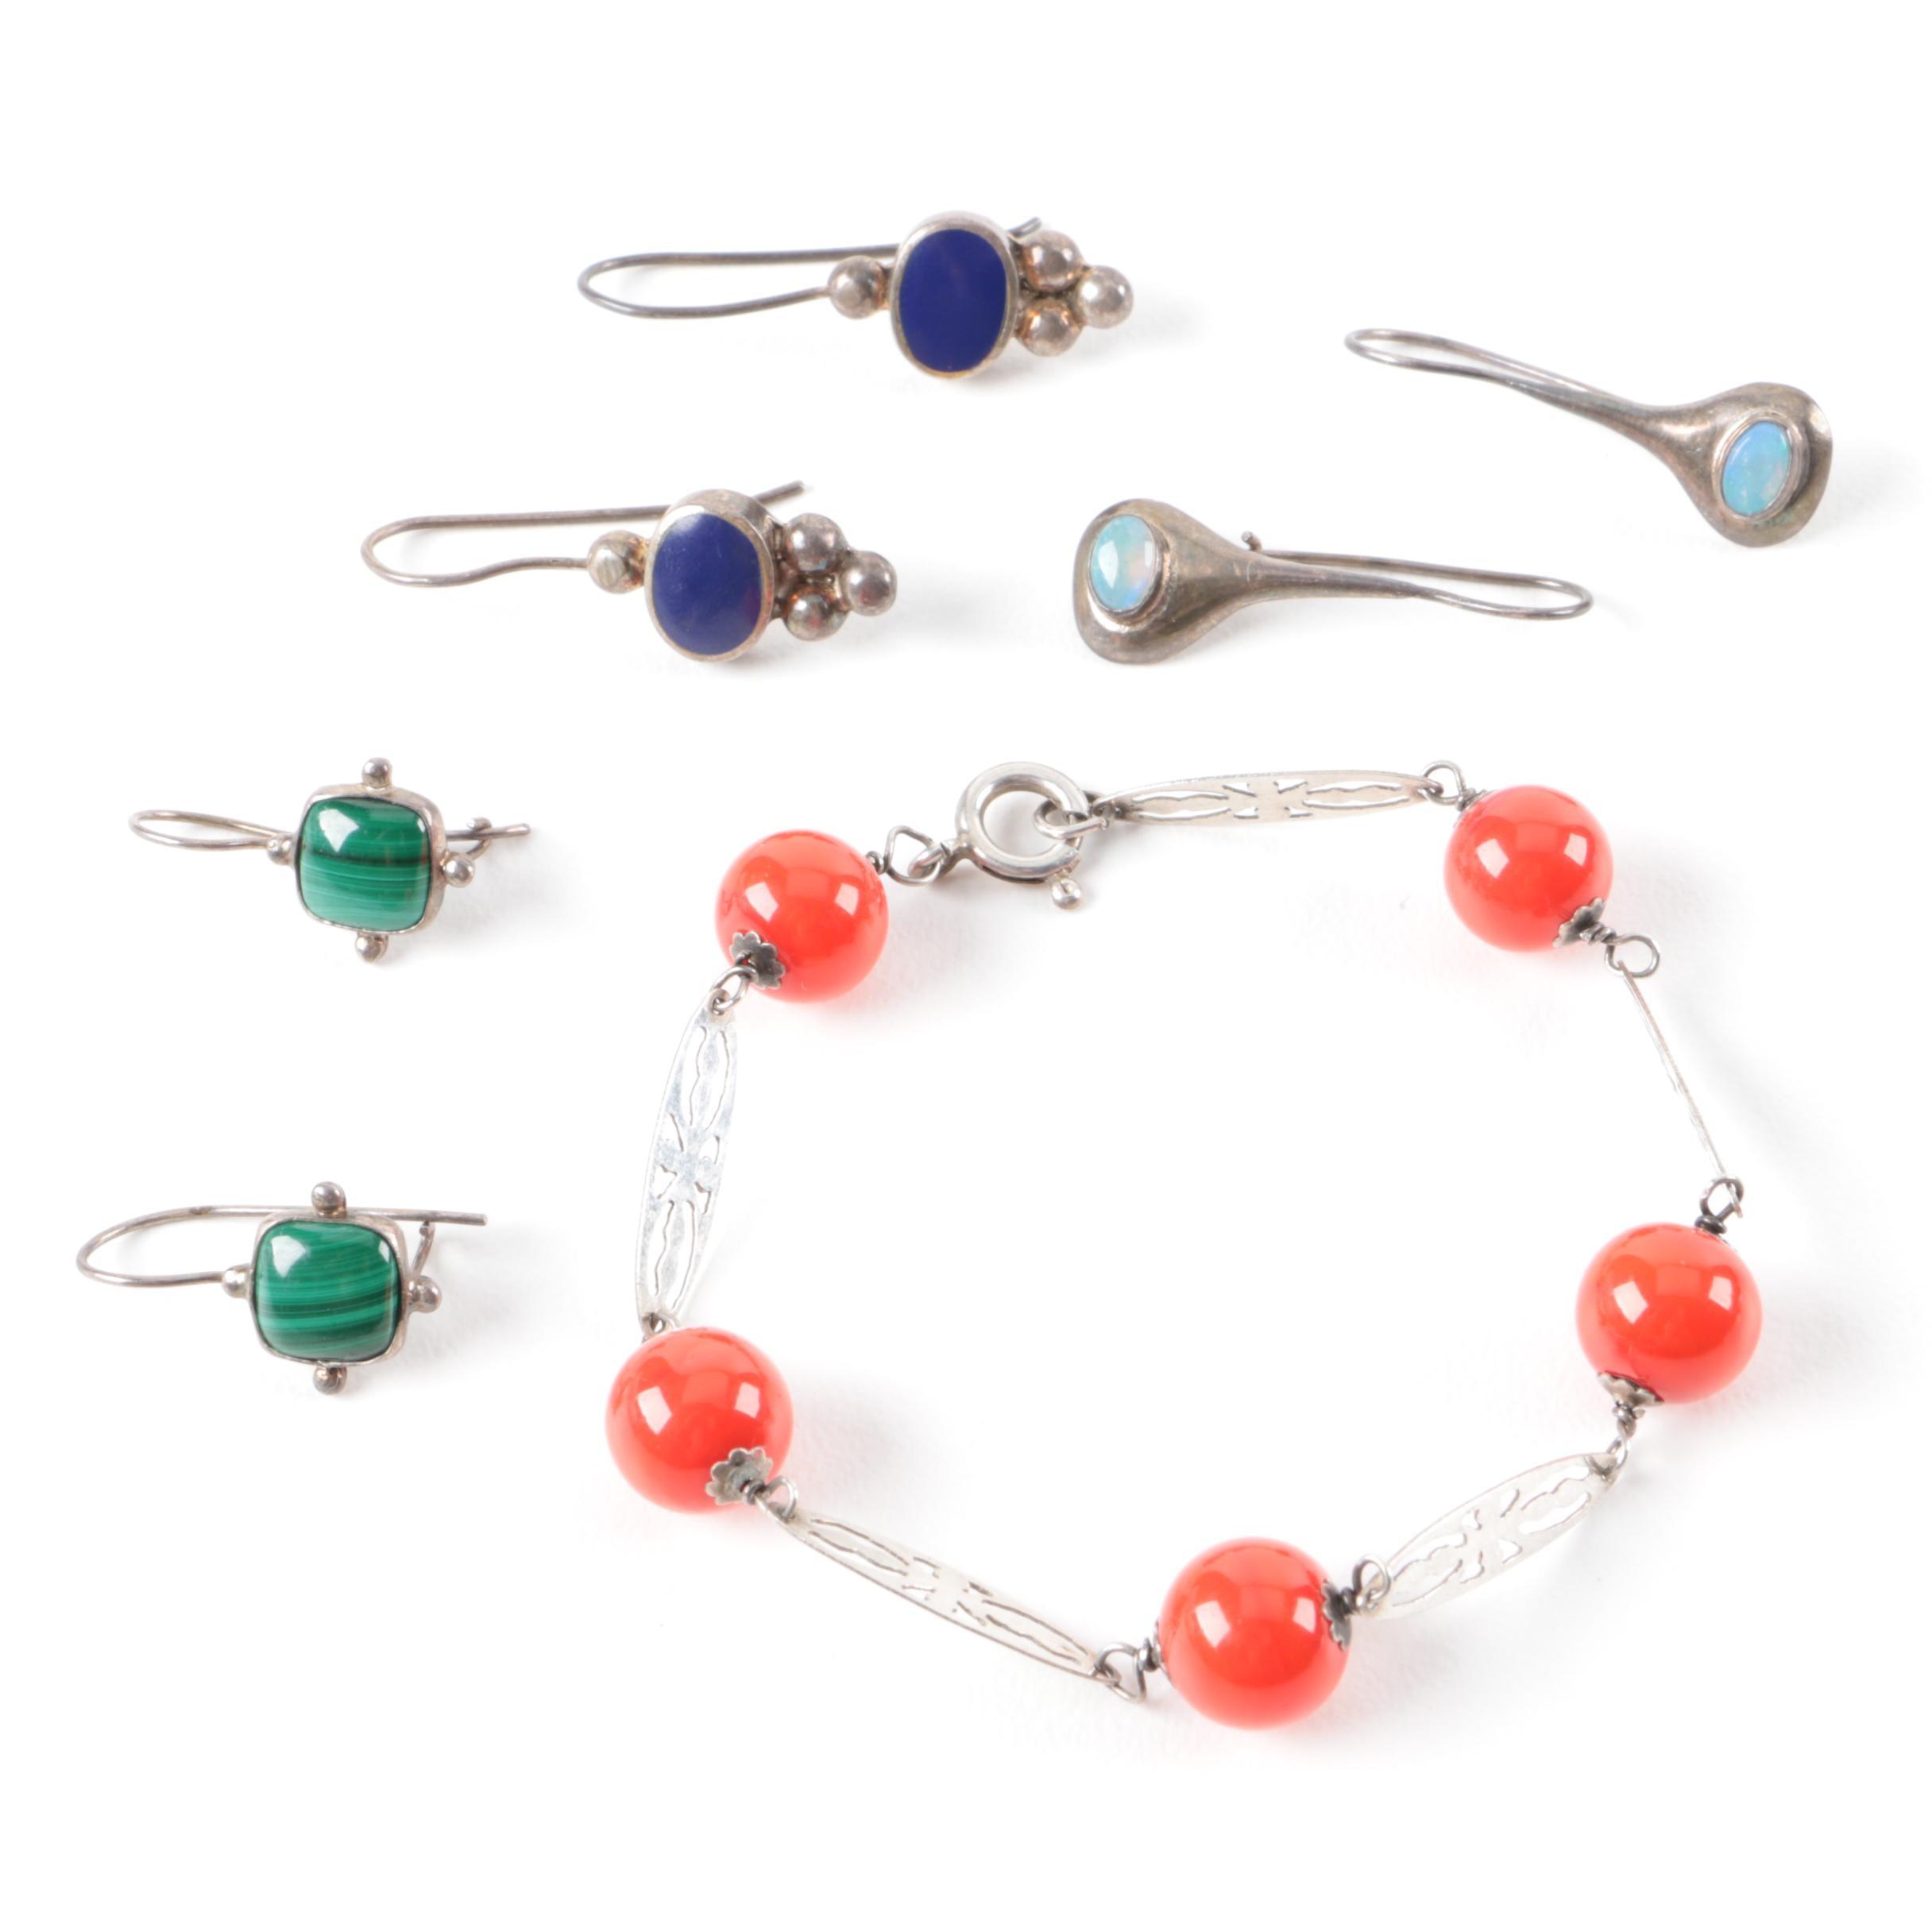 Sterling Silver Earrings and Bracelet Including Gemstones